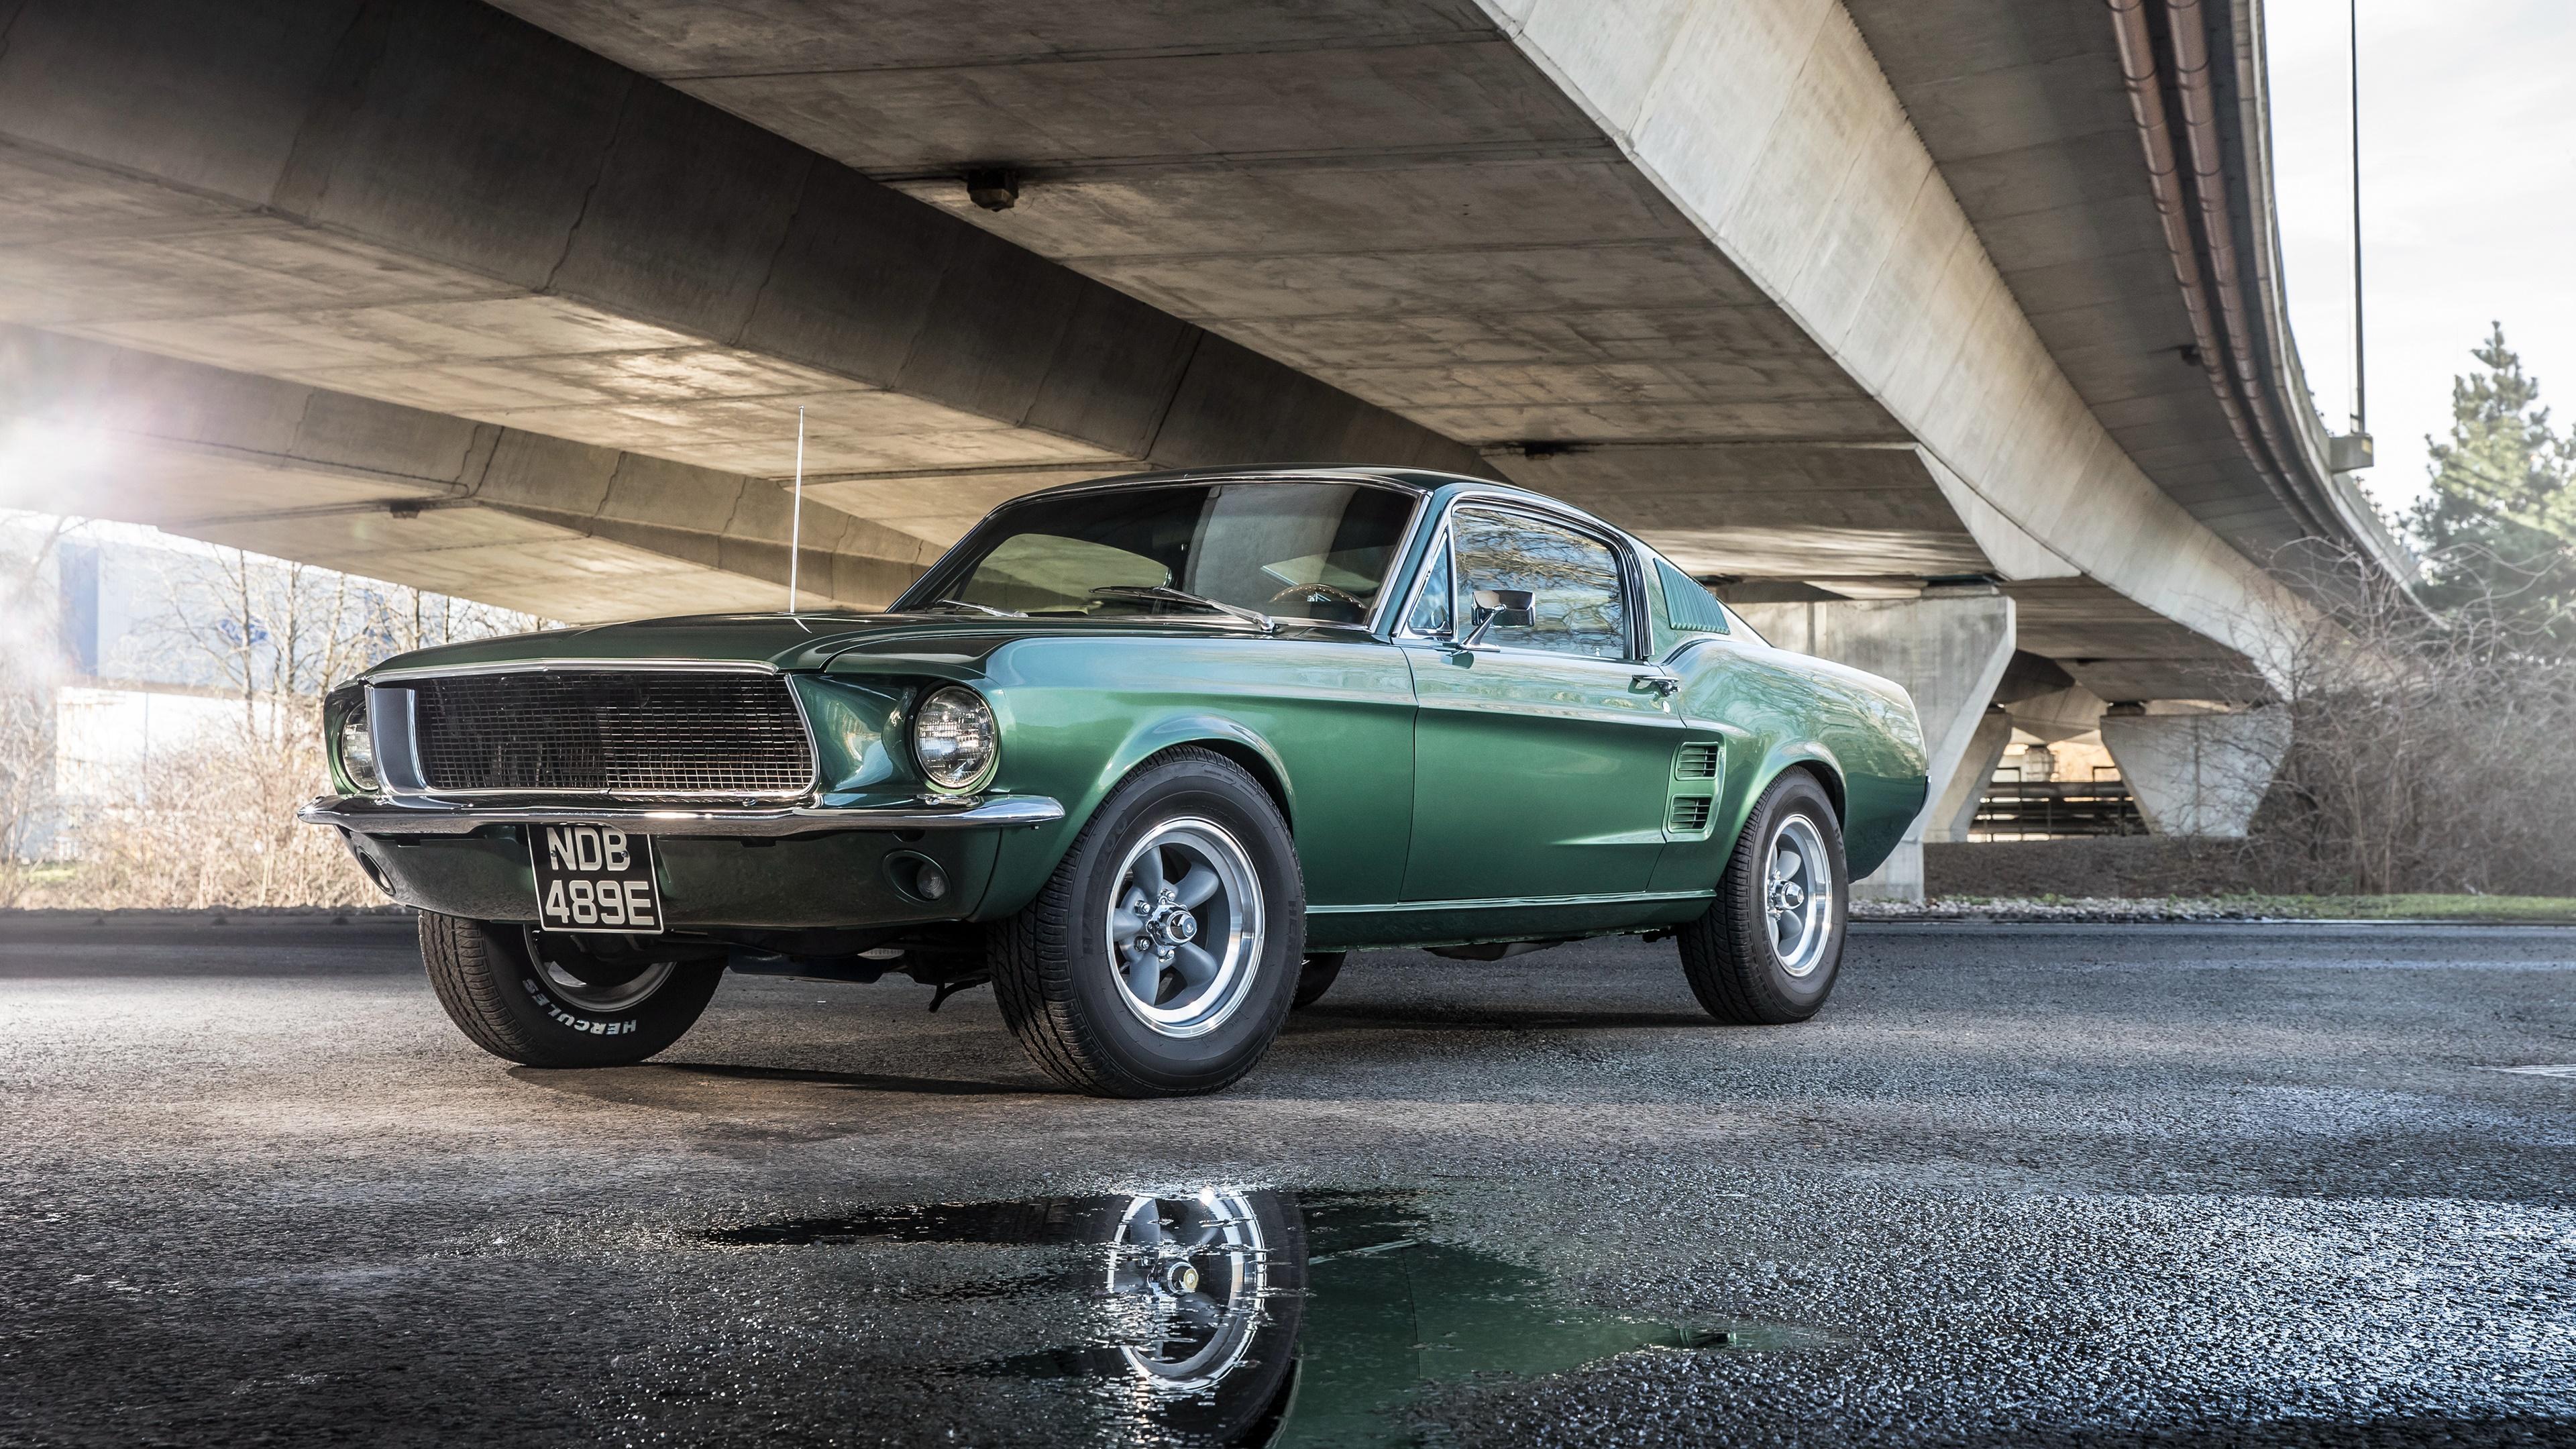 Ford Mustang Bullitt 1968 4k Ultrahd Wallpaper Backiee Free